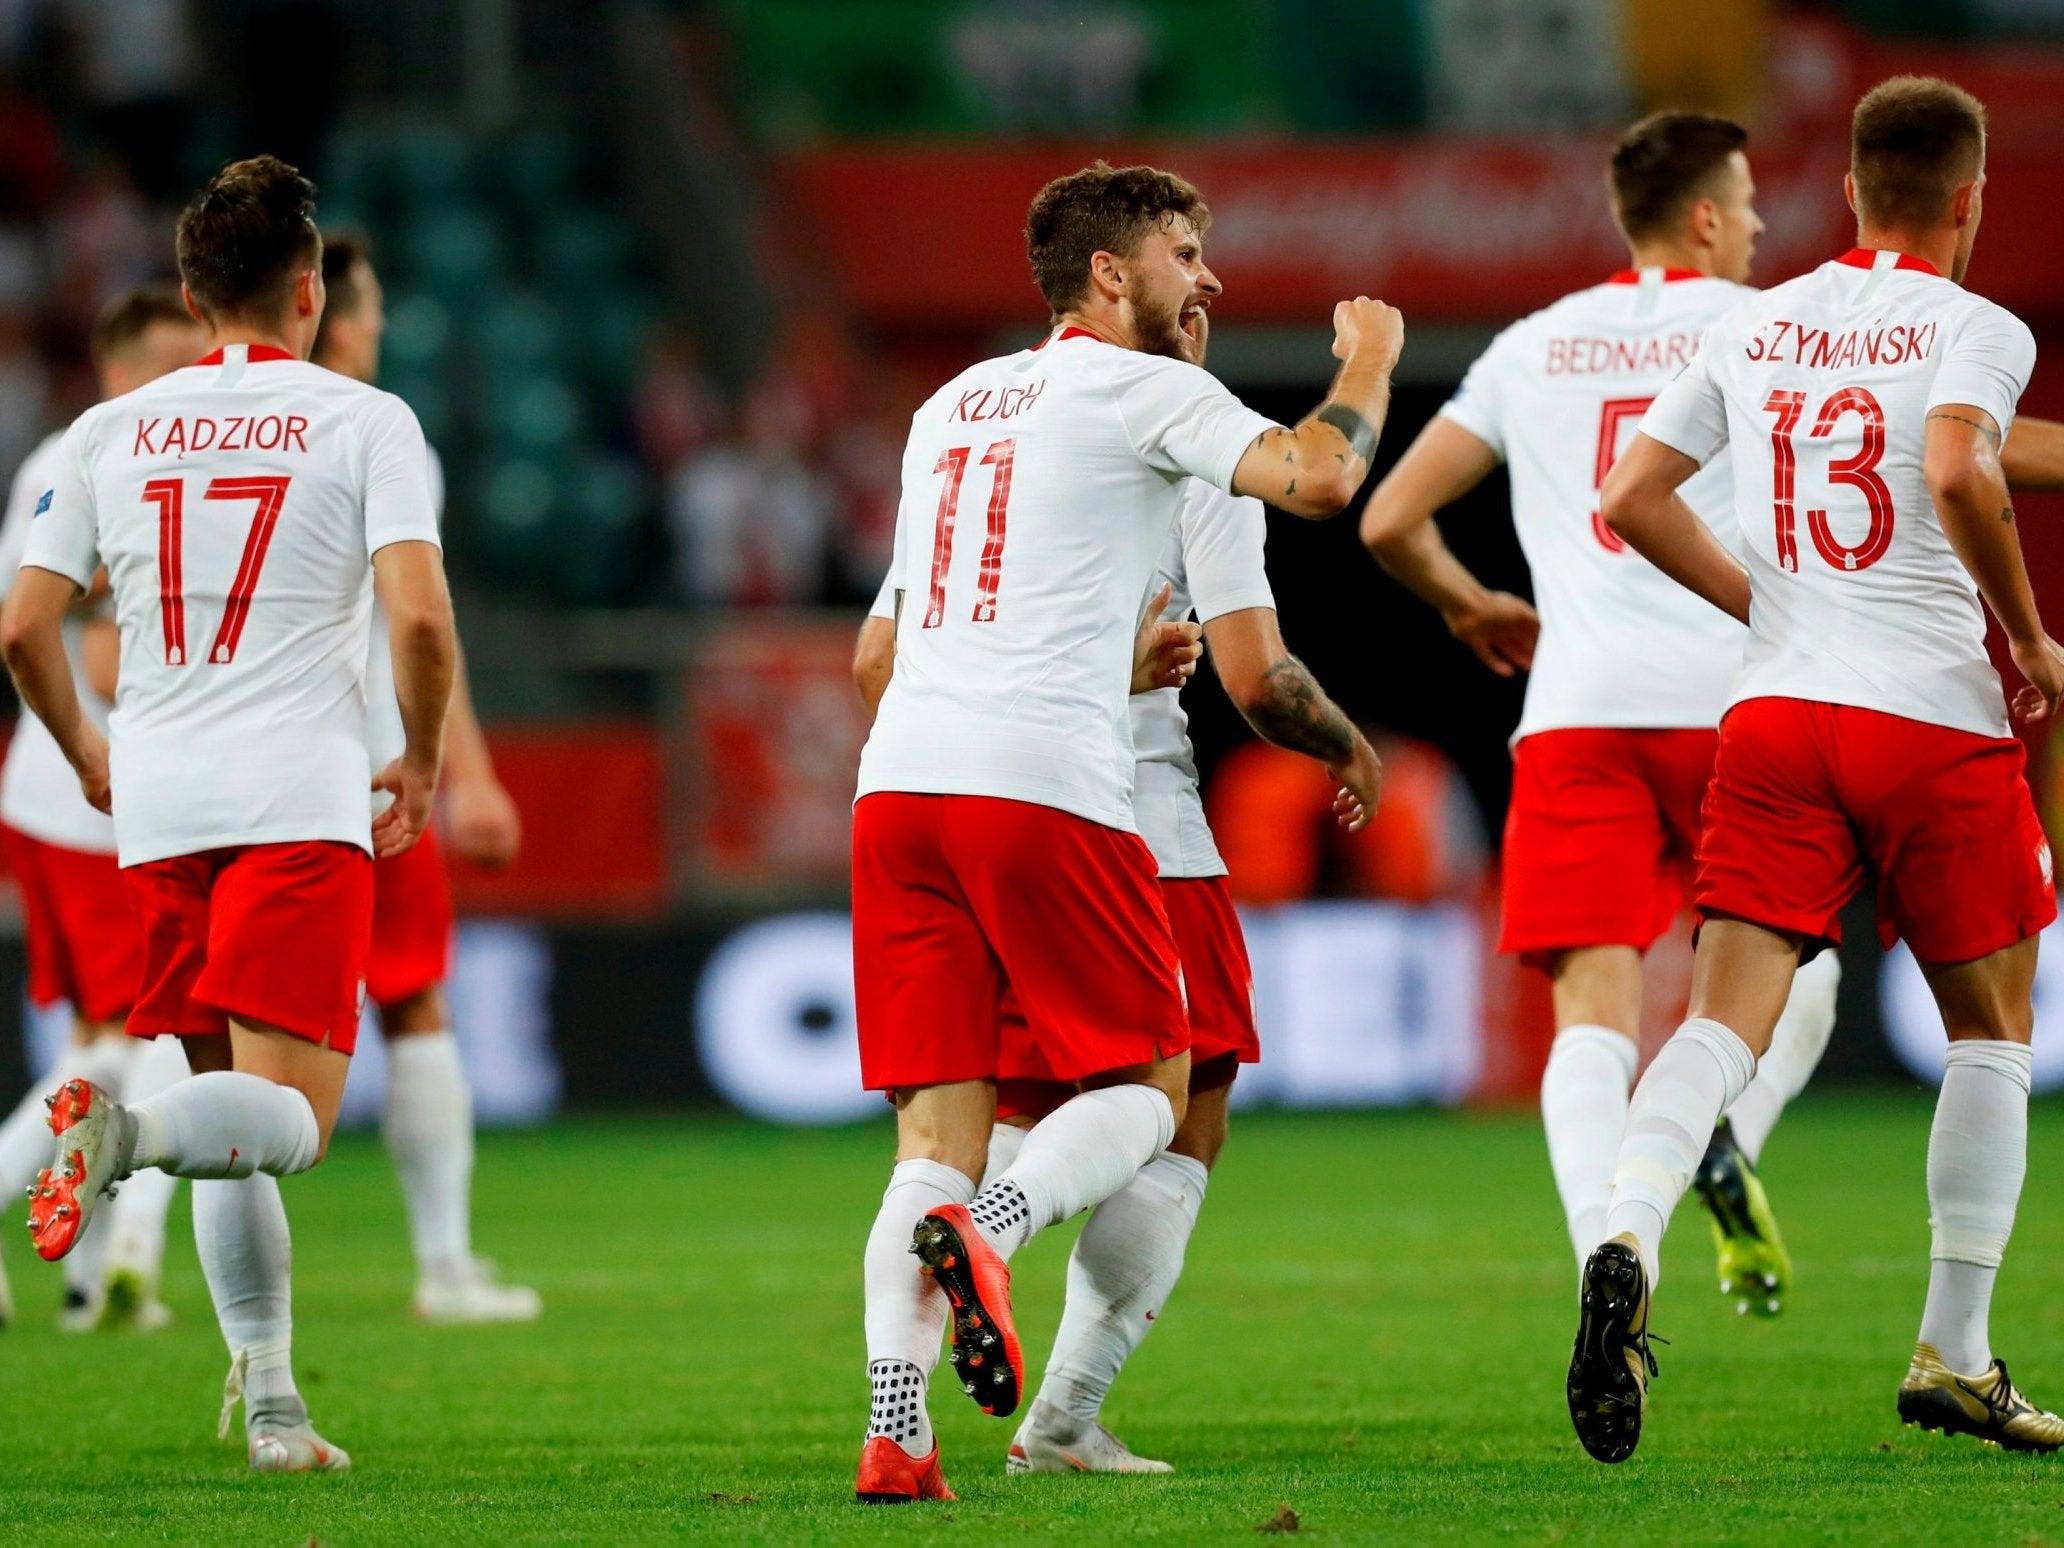 Republic of Ireland denied morale-boosting win in Poland ...